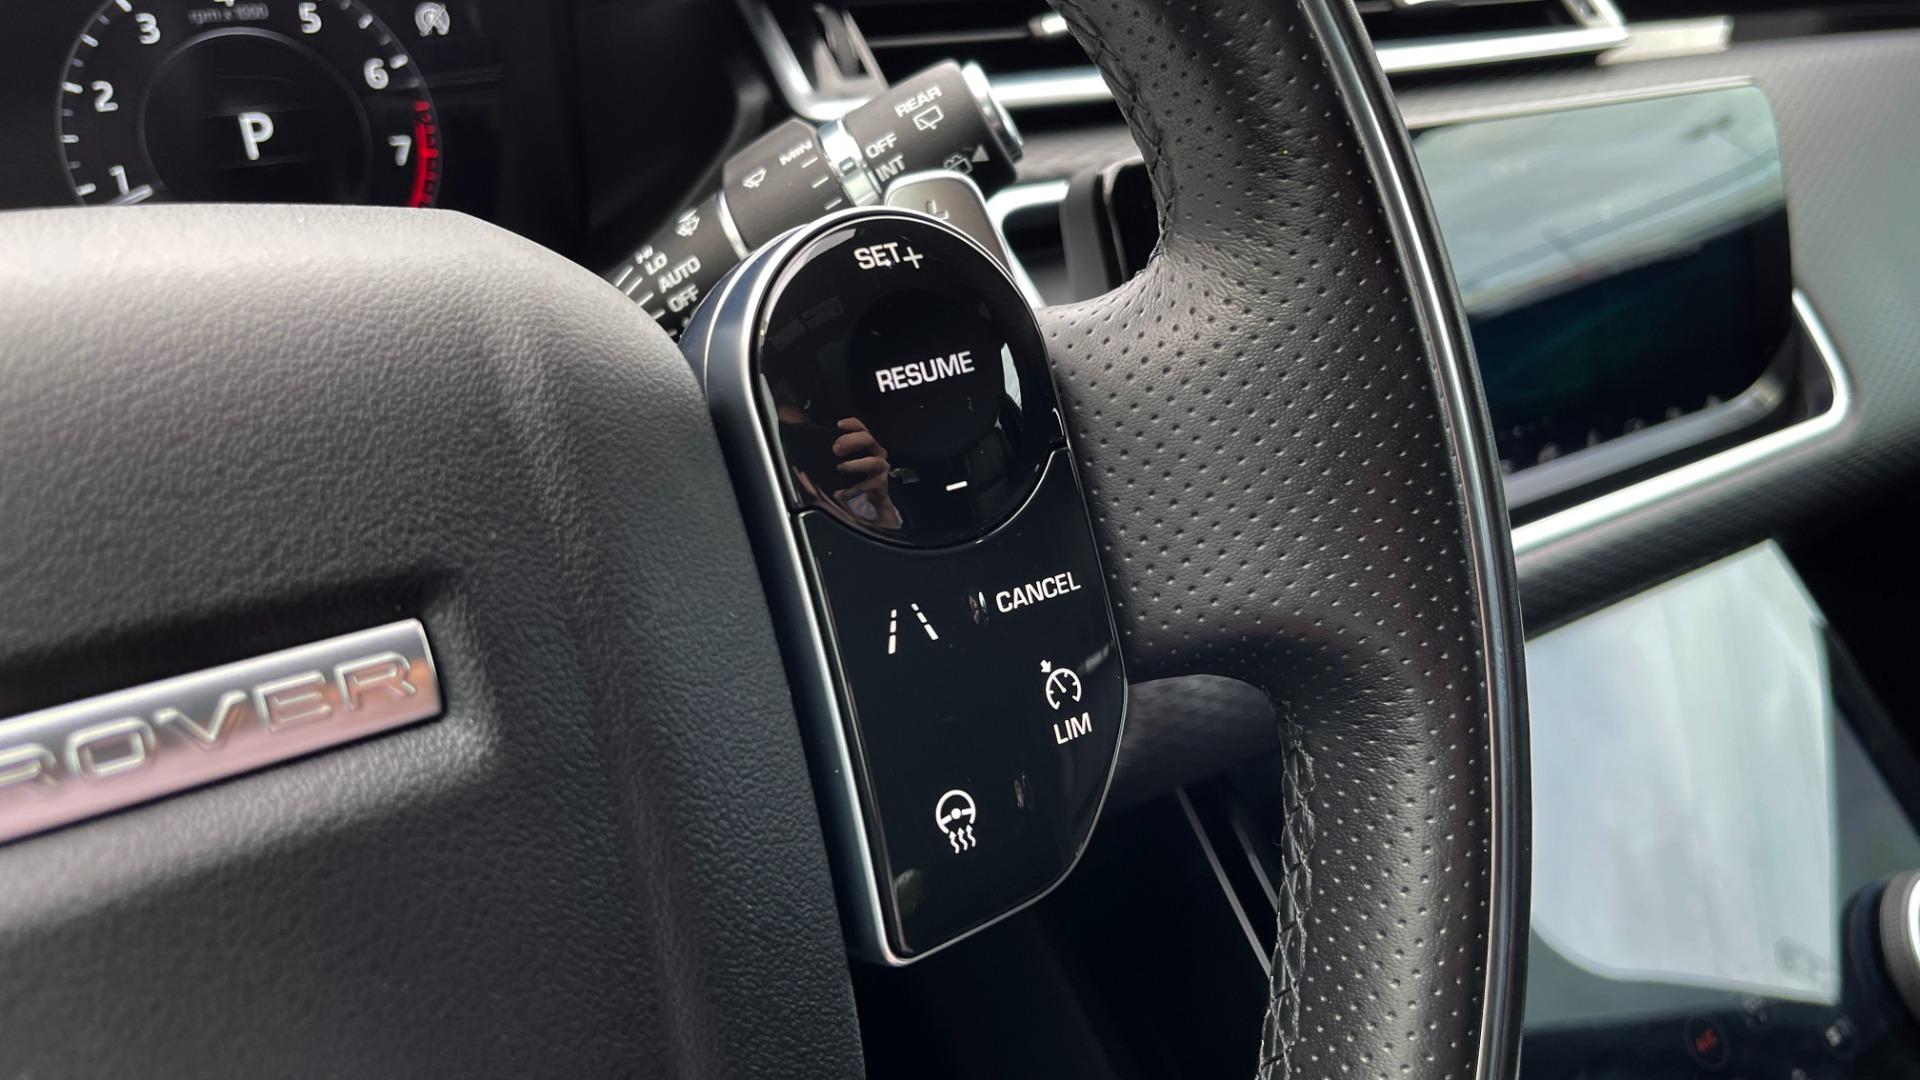 Used 2018 Land Rover RANGE ROVER VELAR R-DYNAMIC SE / NAV / PREM / MERIDIAN / SUNROOF / REARVIEW for sale $54,995 at Formula Imports in Charlotte NC 28227 35